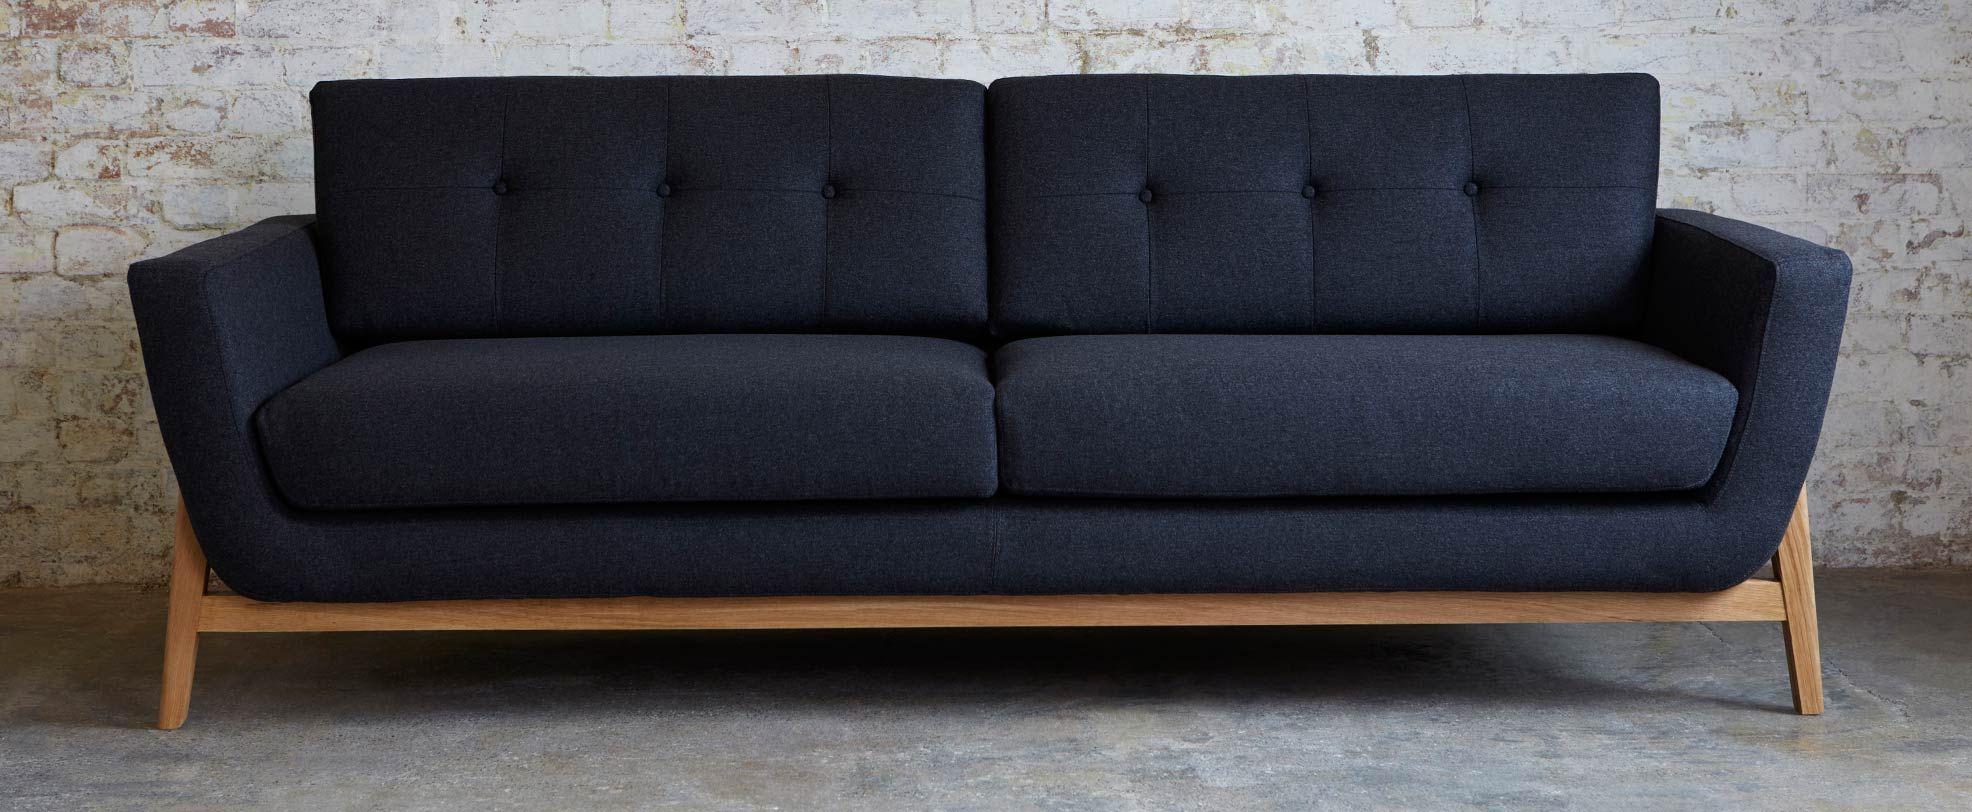 canu0027t wait bermondsey large sofa - Large Sofas